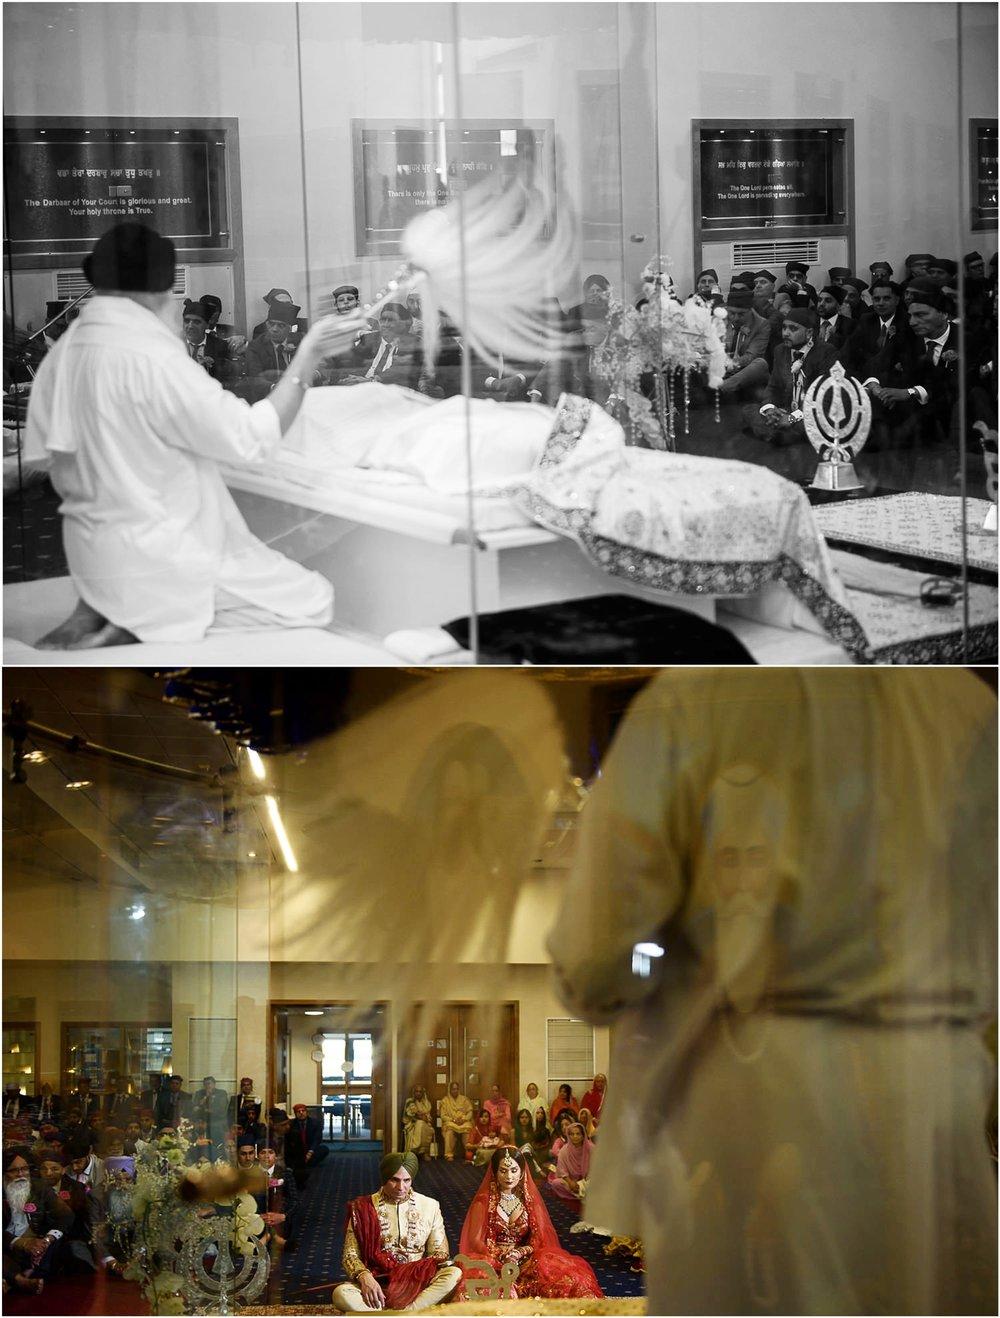 Sikh Giani doing prayers at wedding ceremony